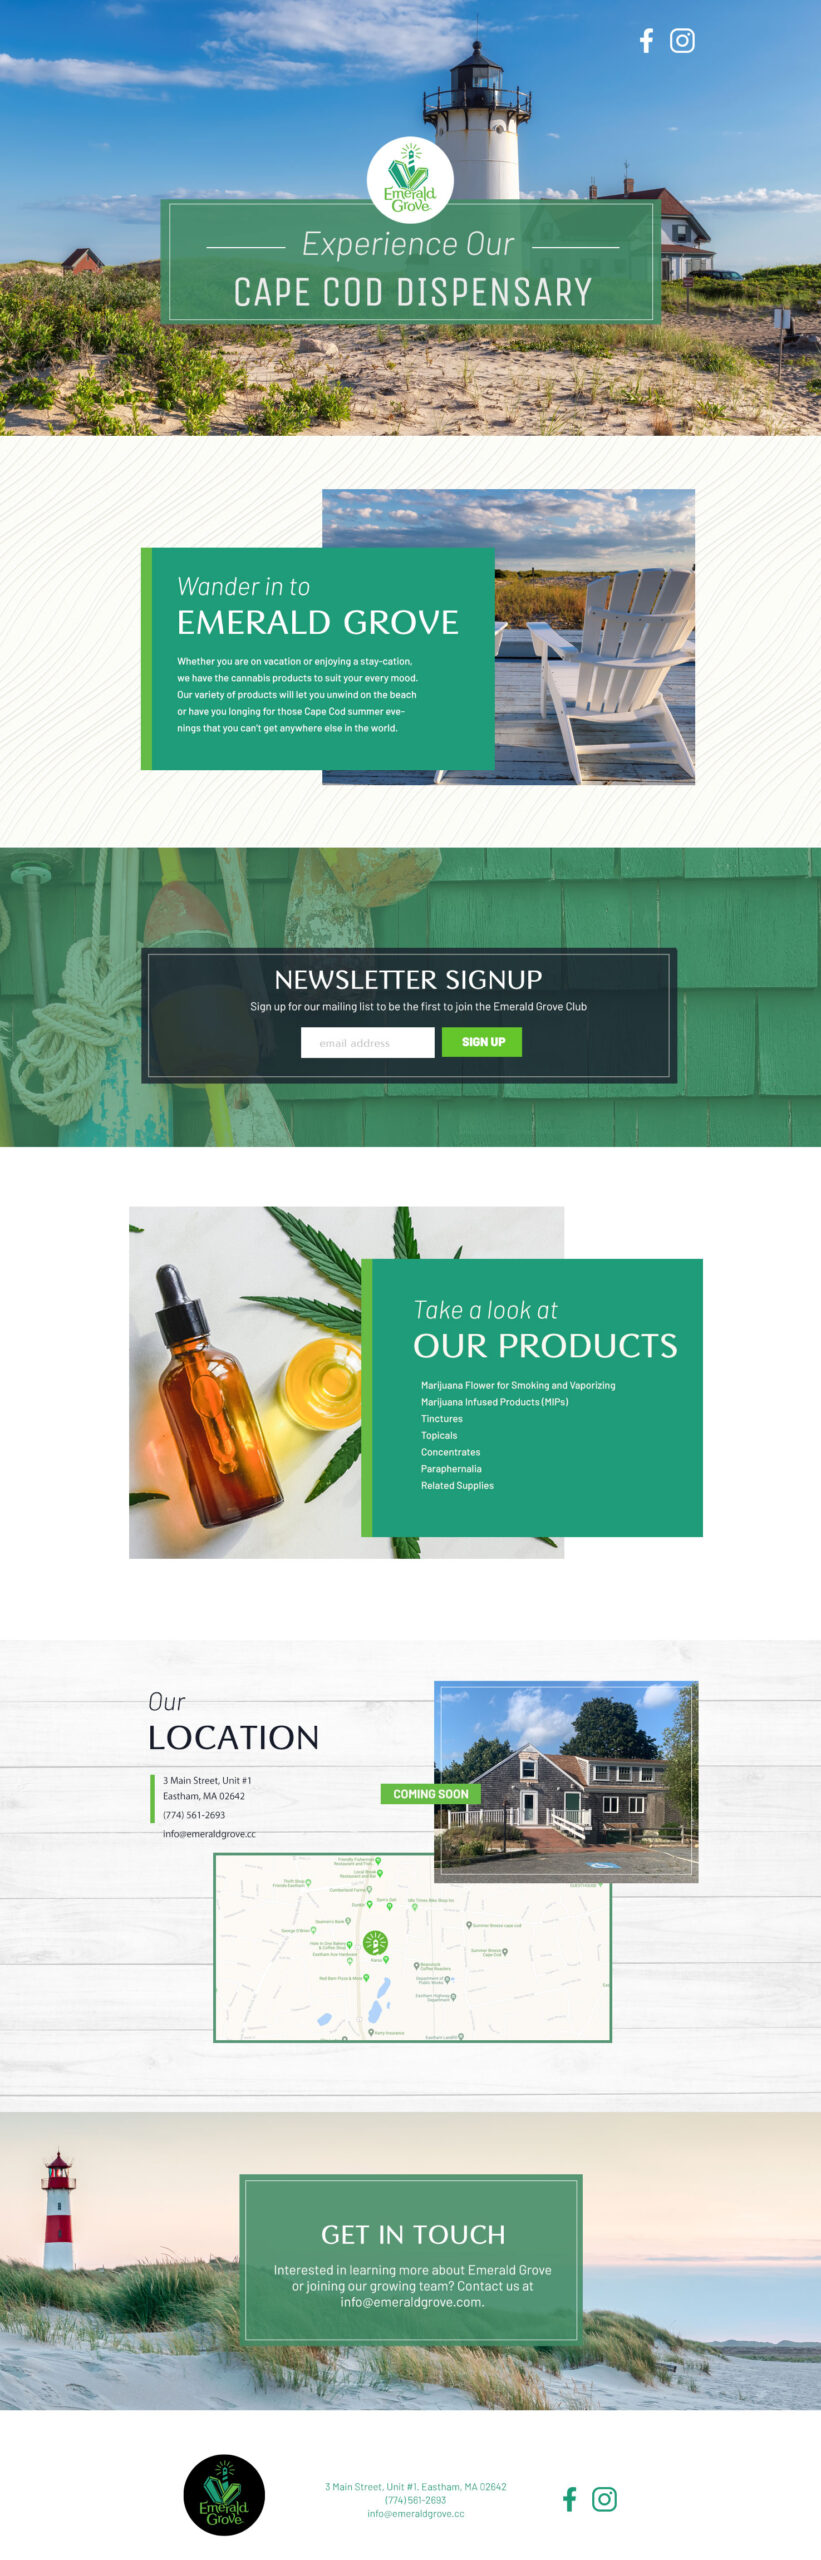 Emerald Grove Landing Page